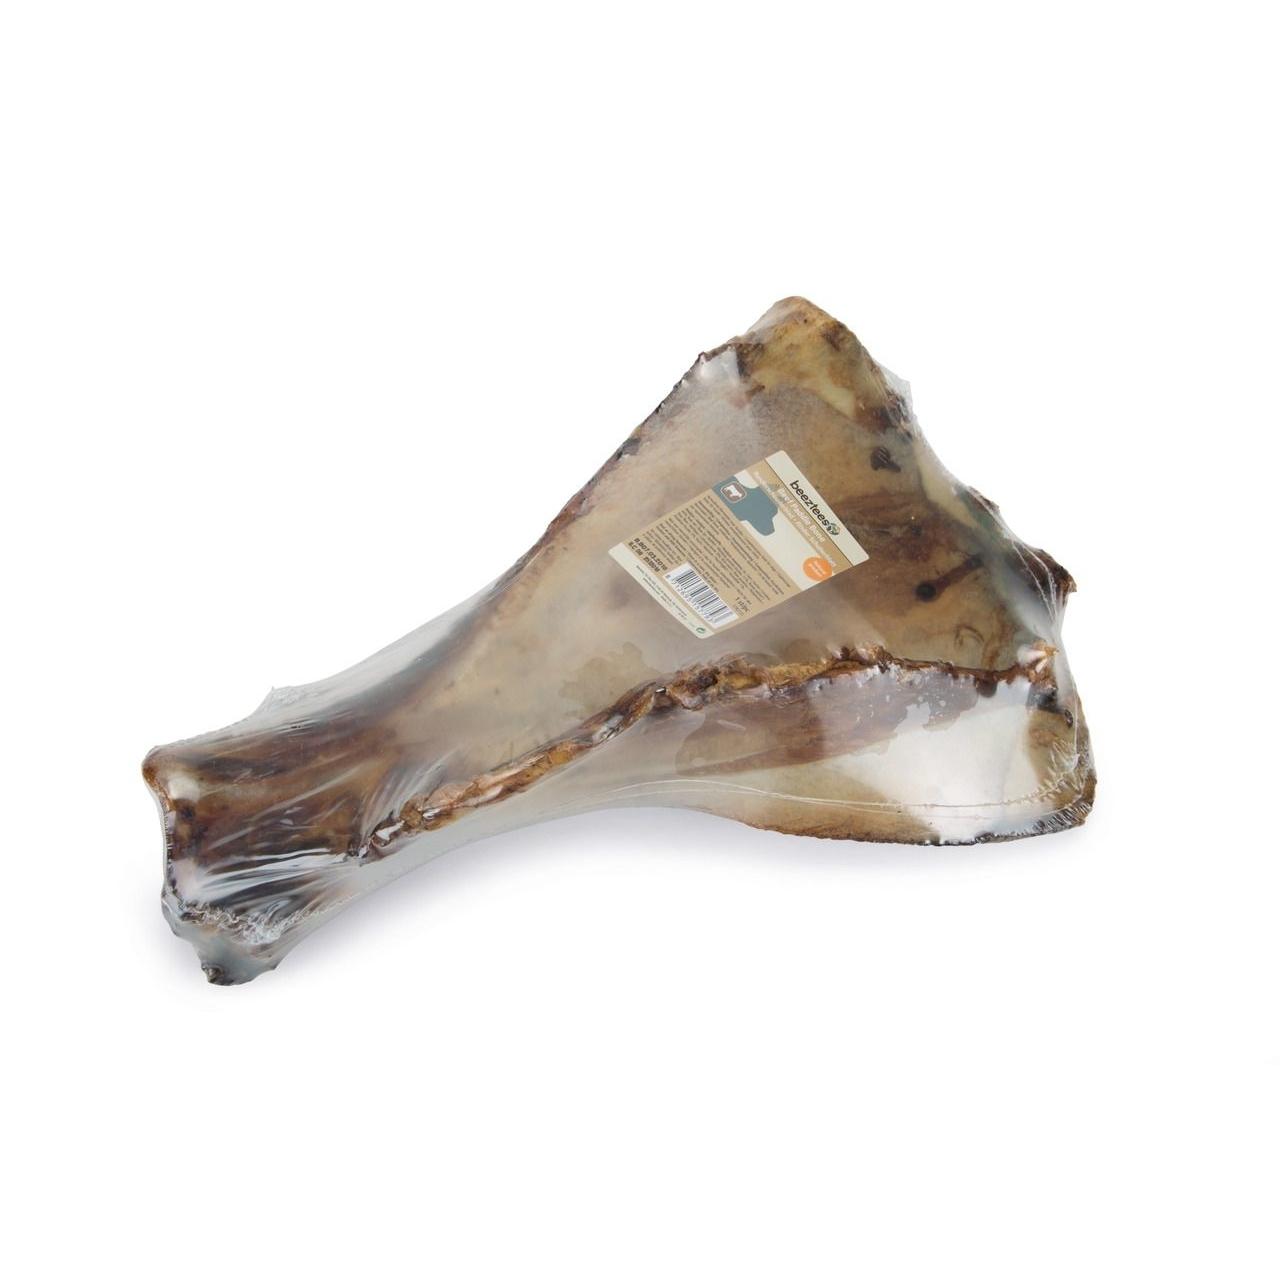 Beeztees Rinder Schulterblatt Hundeknochen, 33 cm